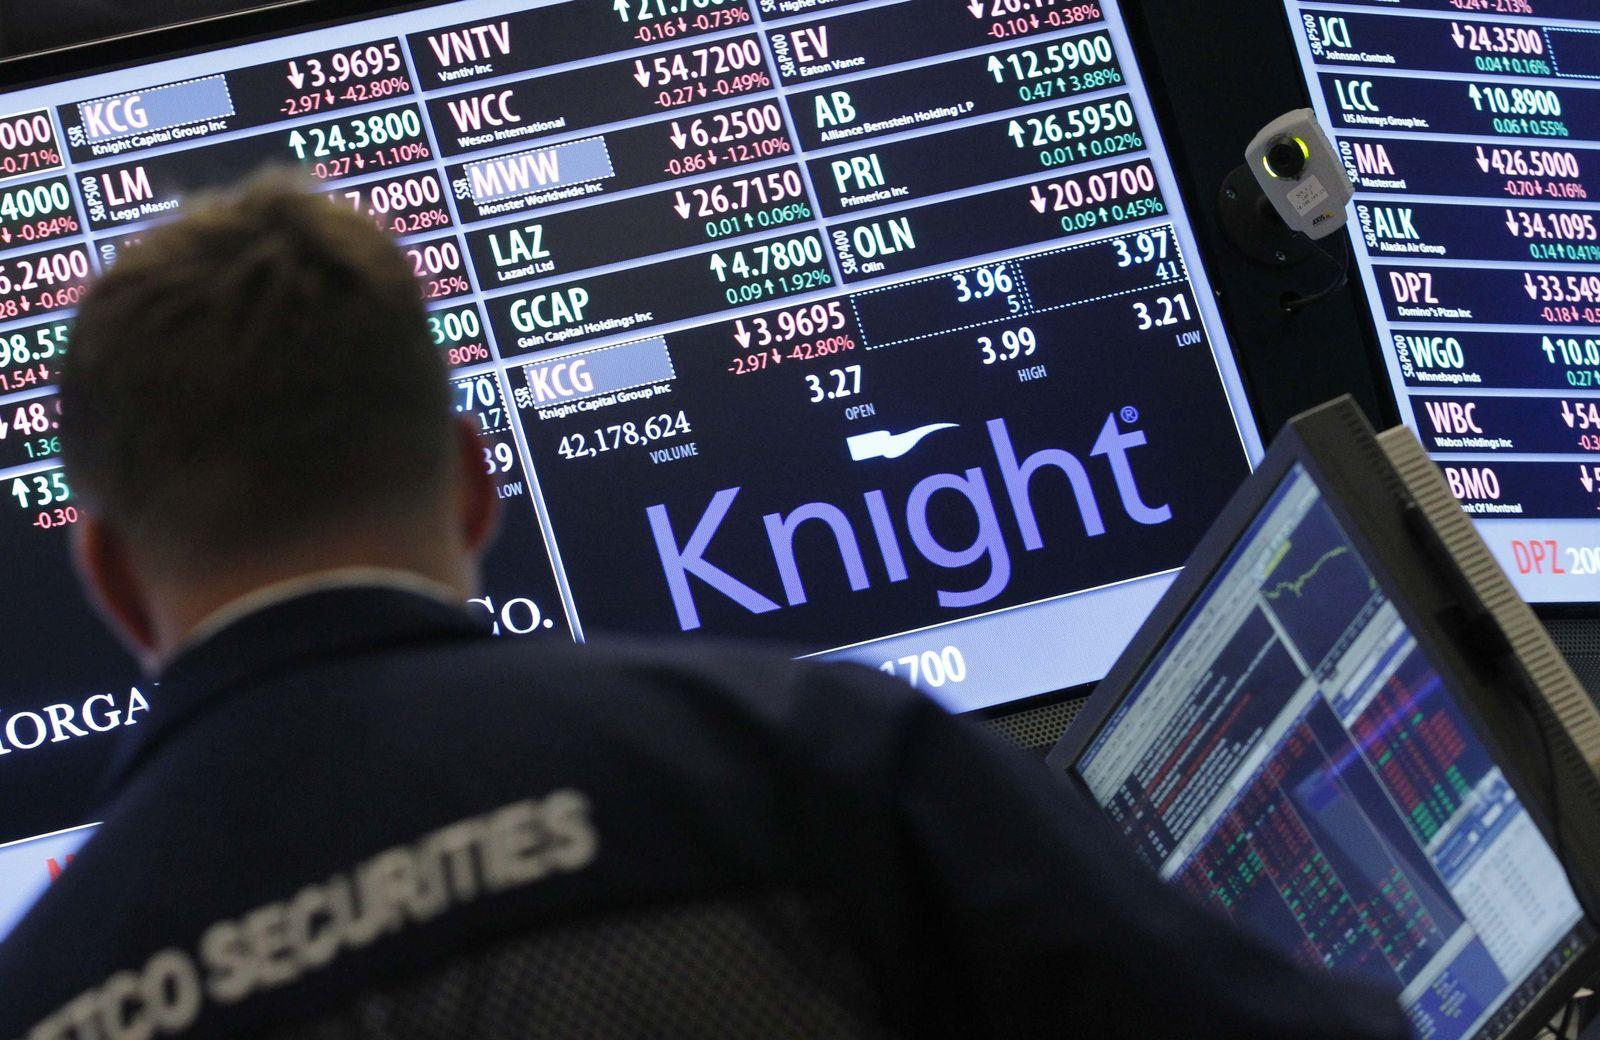 Knight Capital Group Verlust